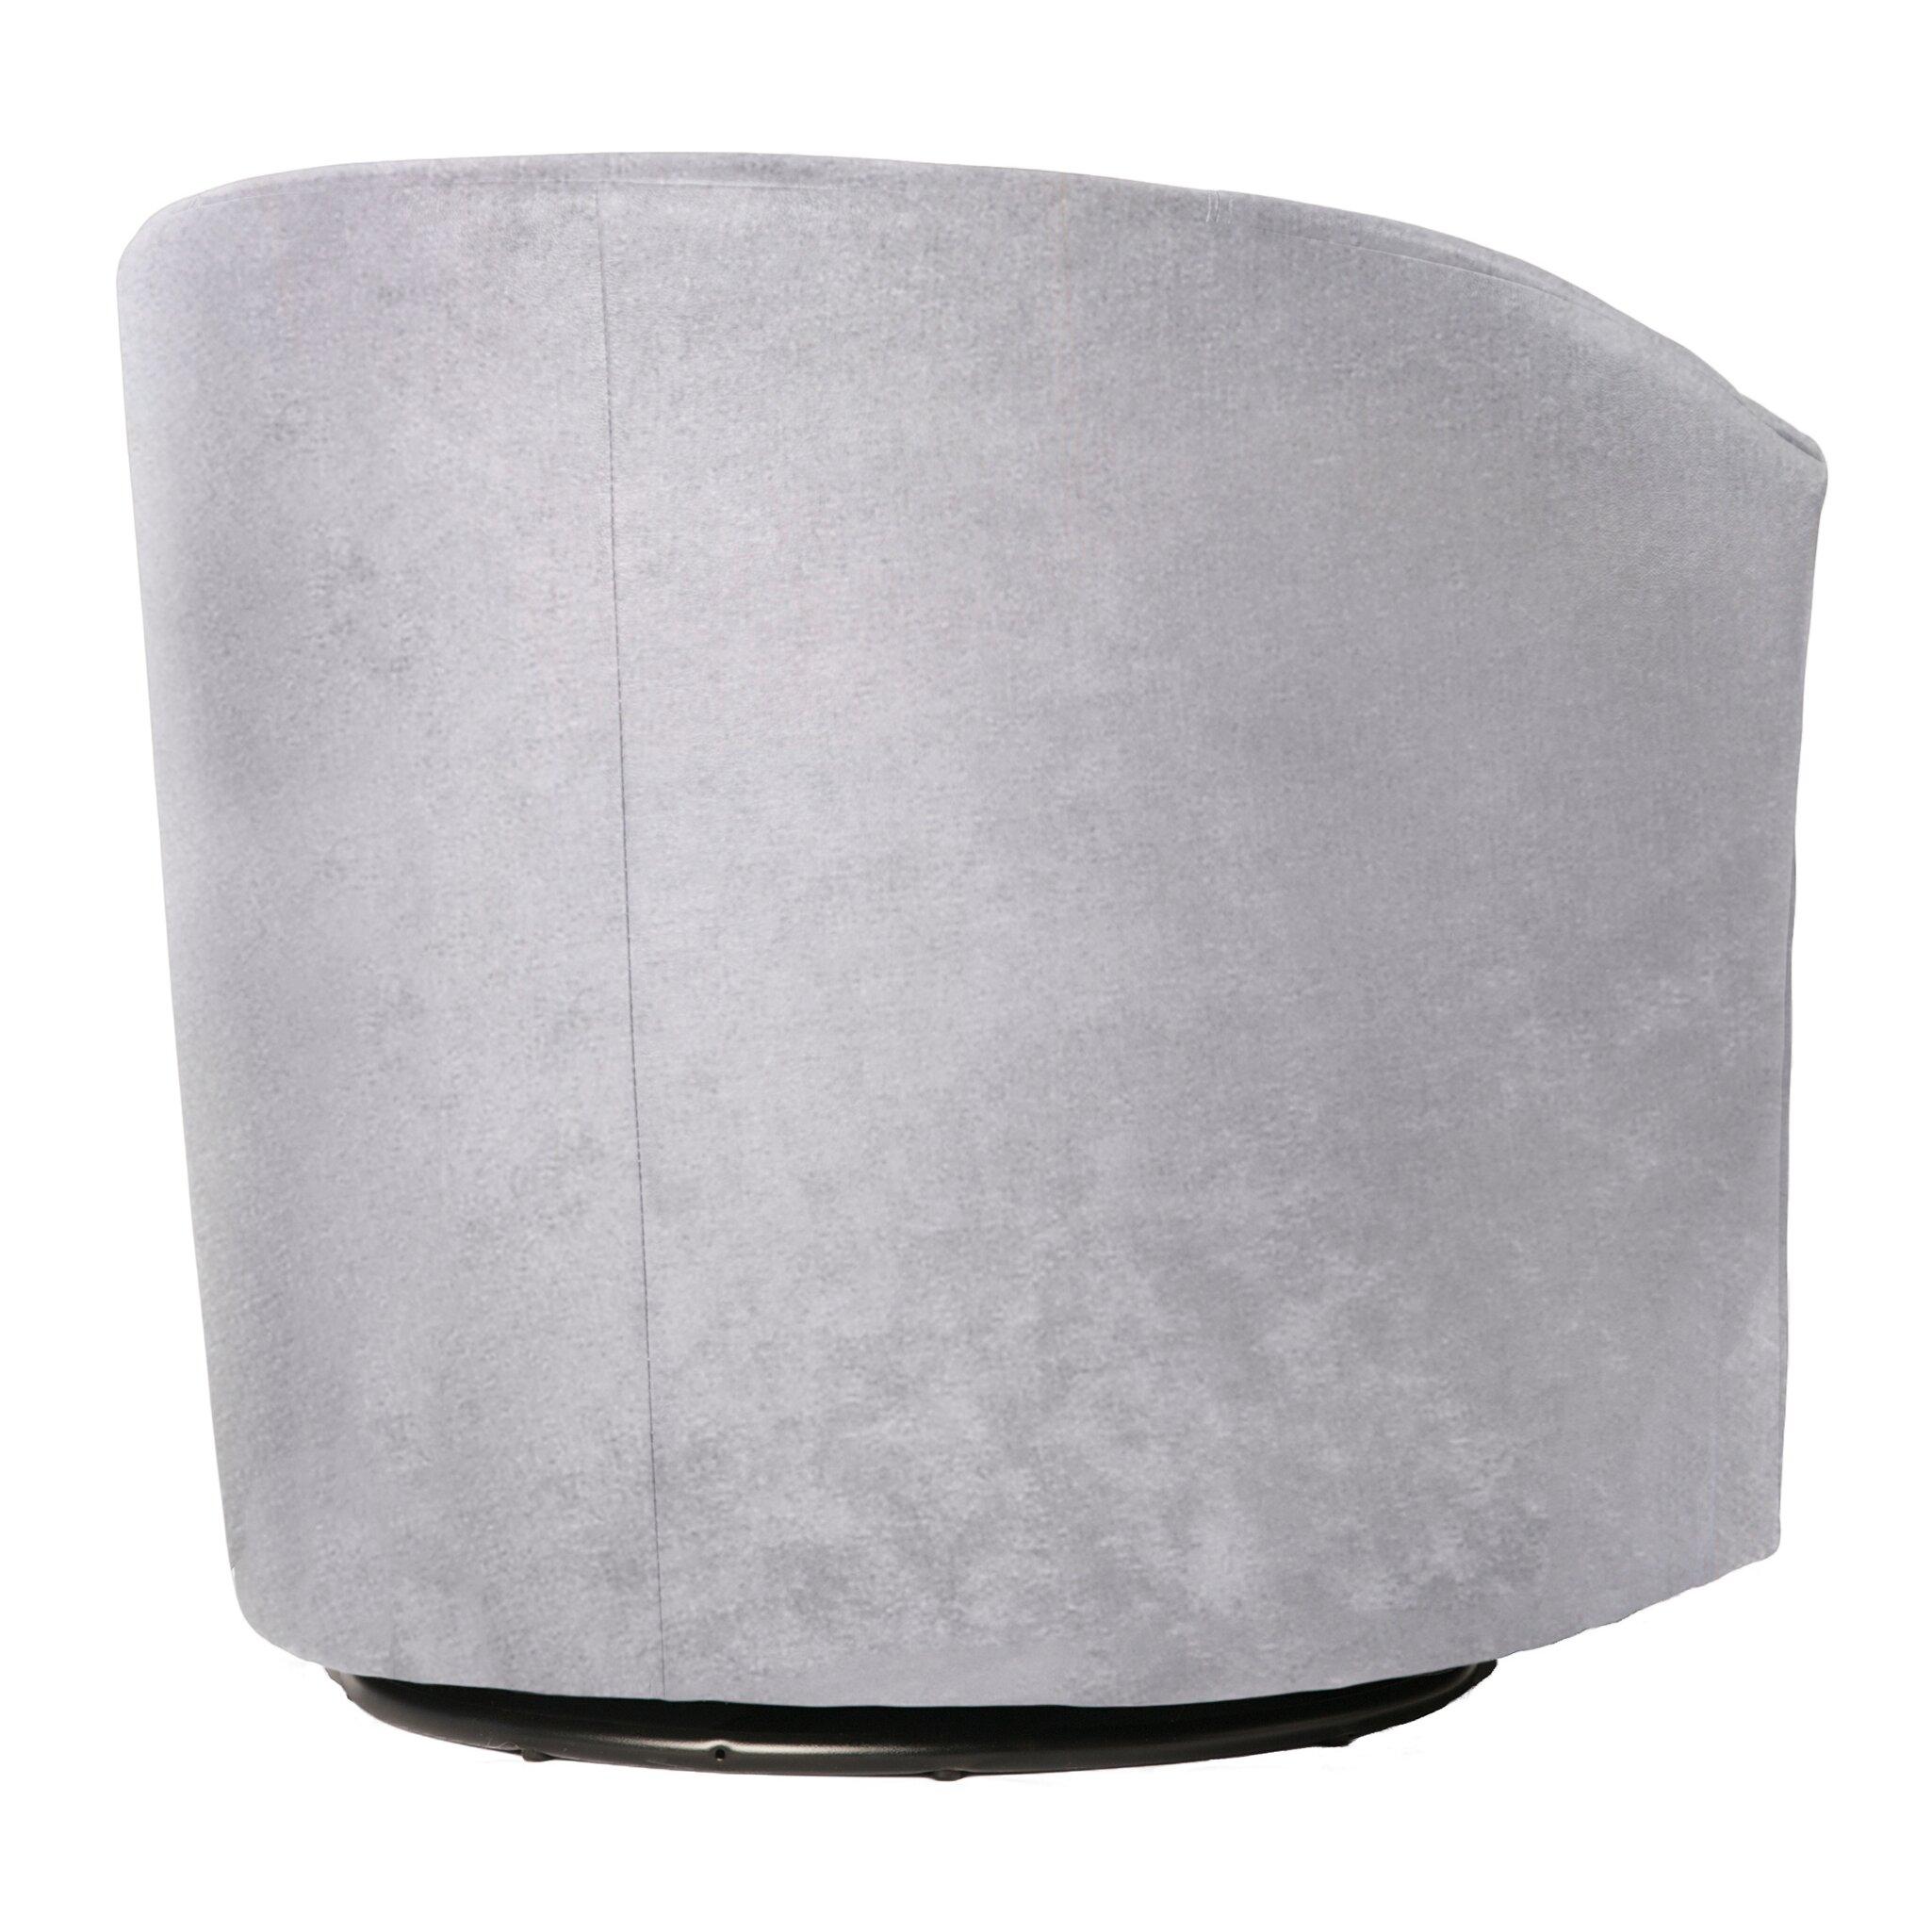 Comfort Pointe Elizabeth Swivel Barrel Chair Amp Reviews